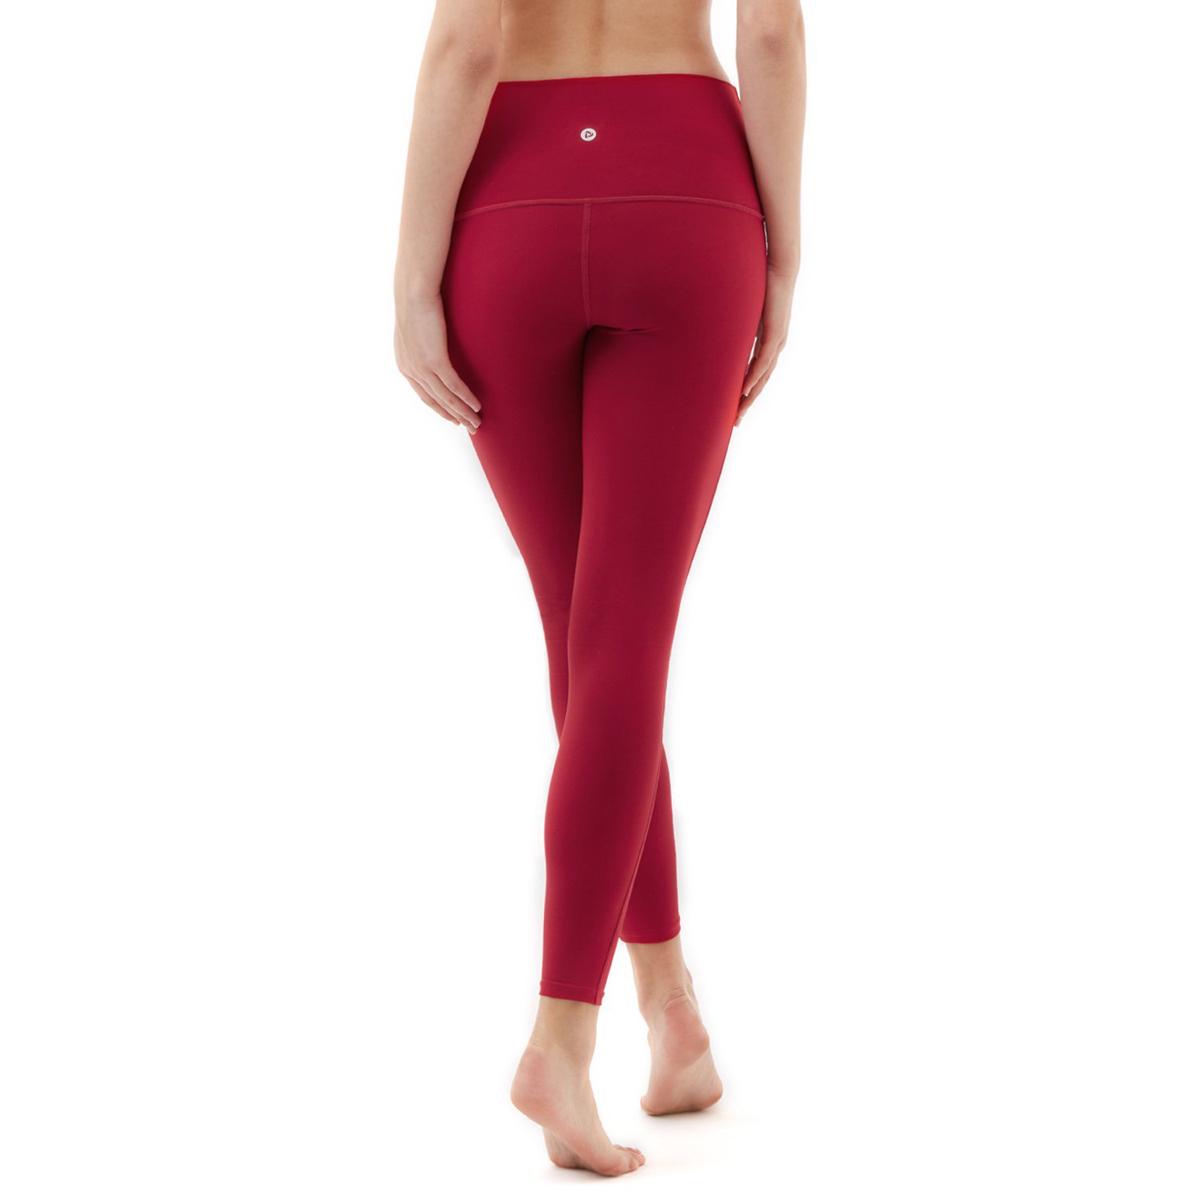 thumbnail 74 - TSLA Tesla FYP42 Women's High-Waisted Ultra-Stretch Tummy Control Yoga Pants